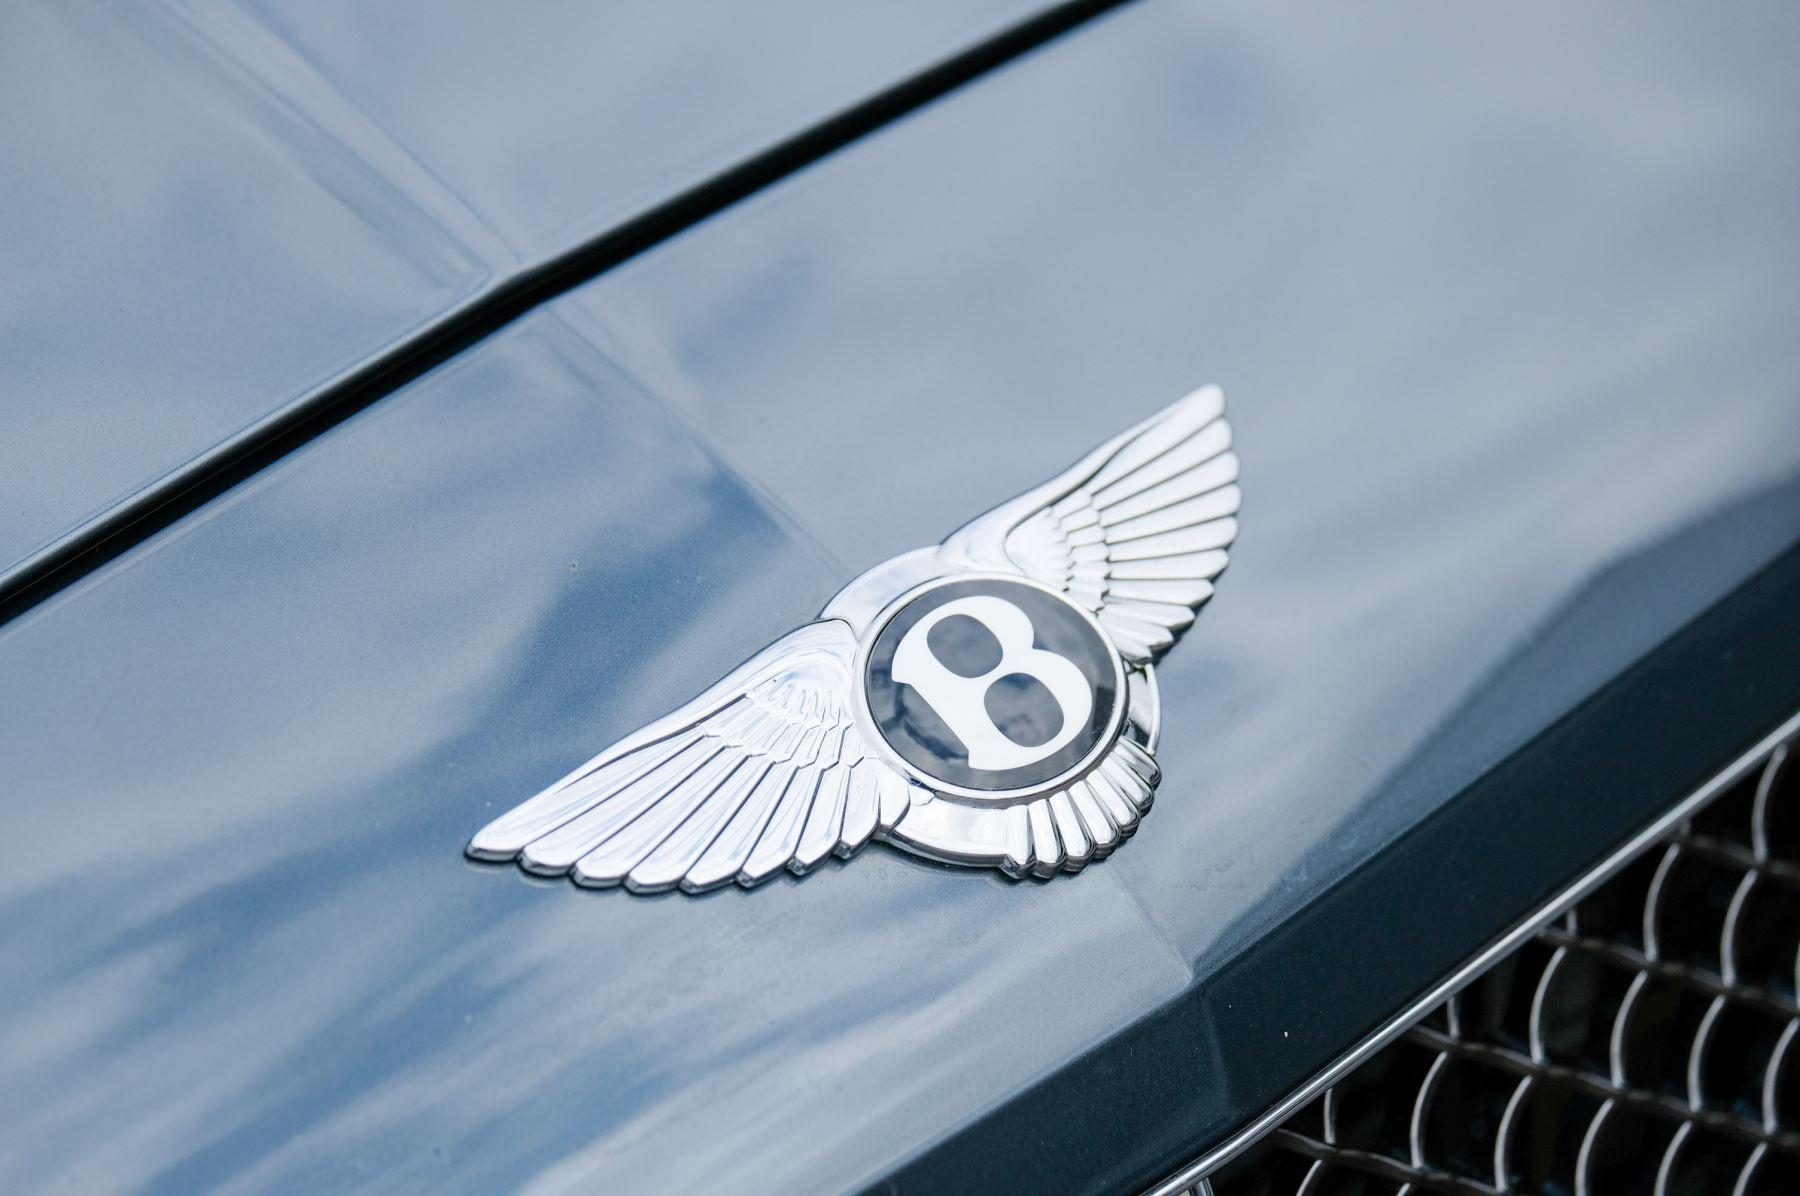 Bentley Continental GTC 6.0 W12 Speed - Massage Seats & Ventilation - Neck Warmer - Rear View Camera image 8